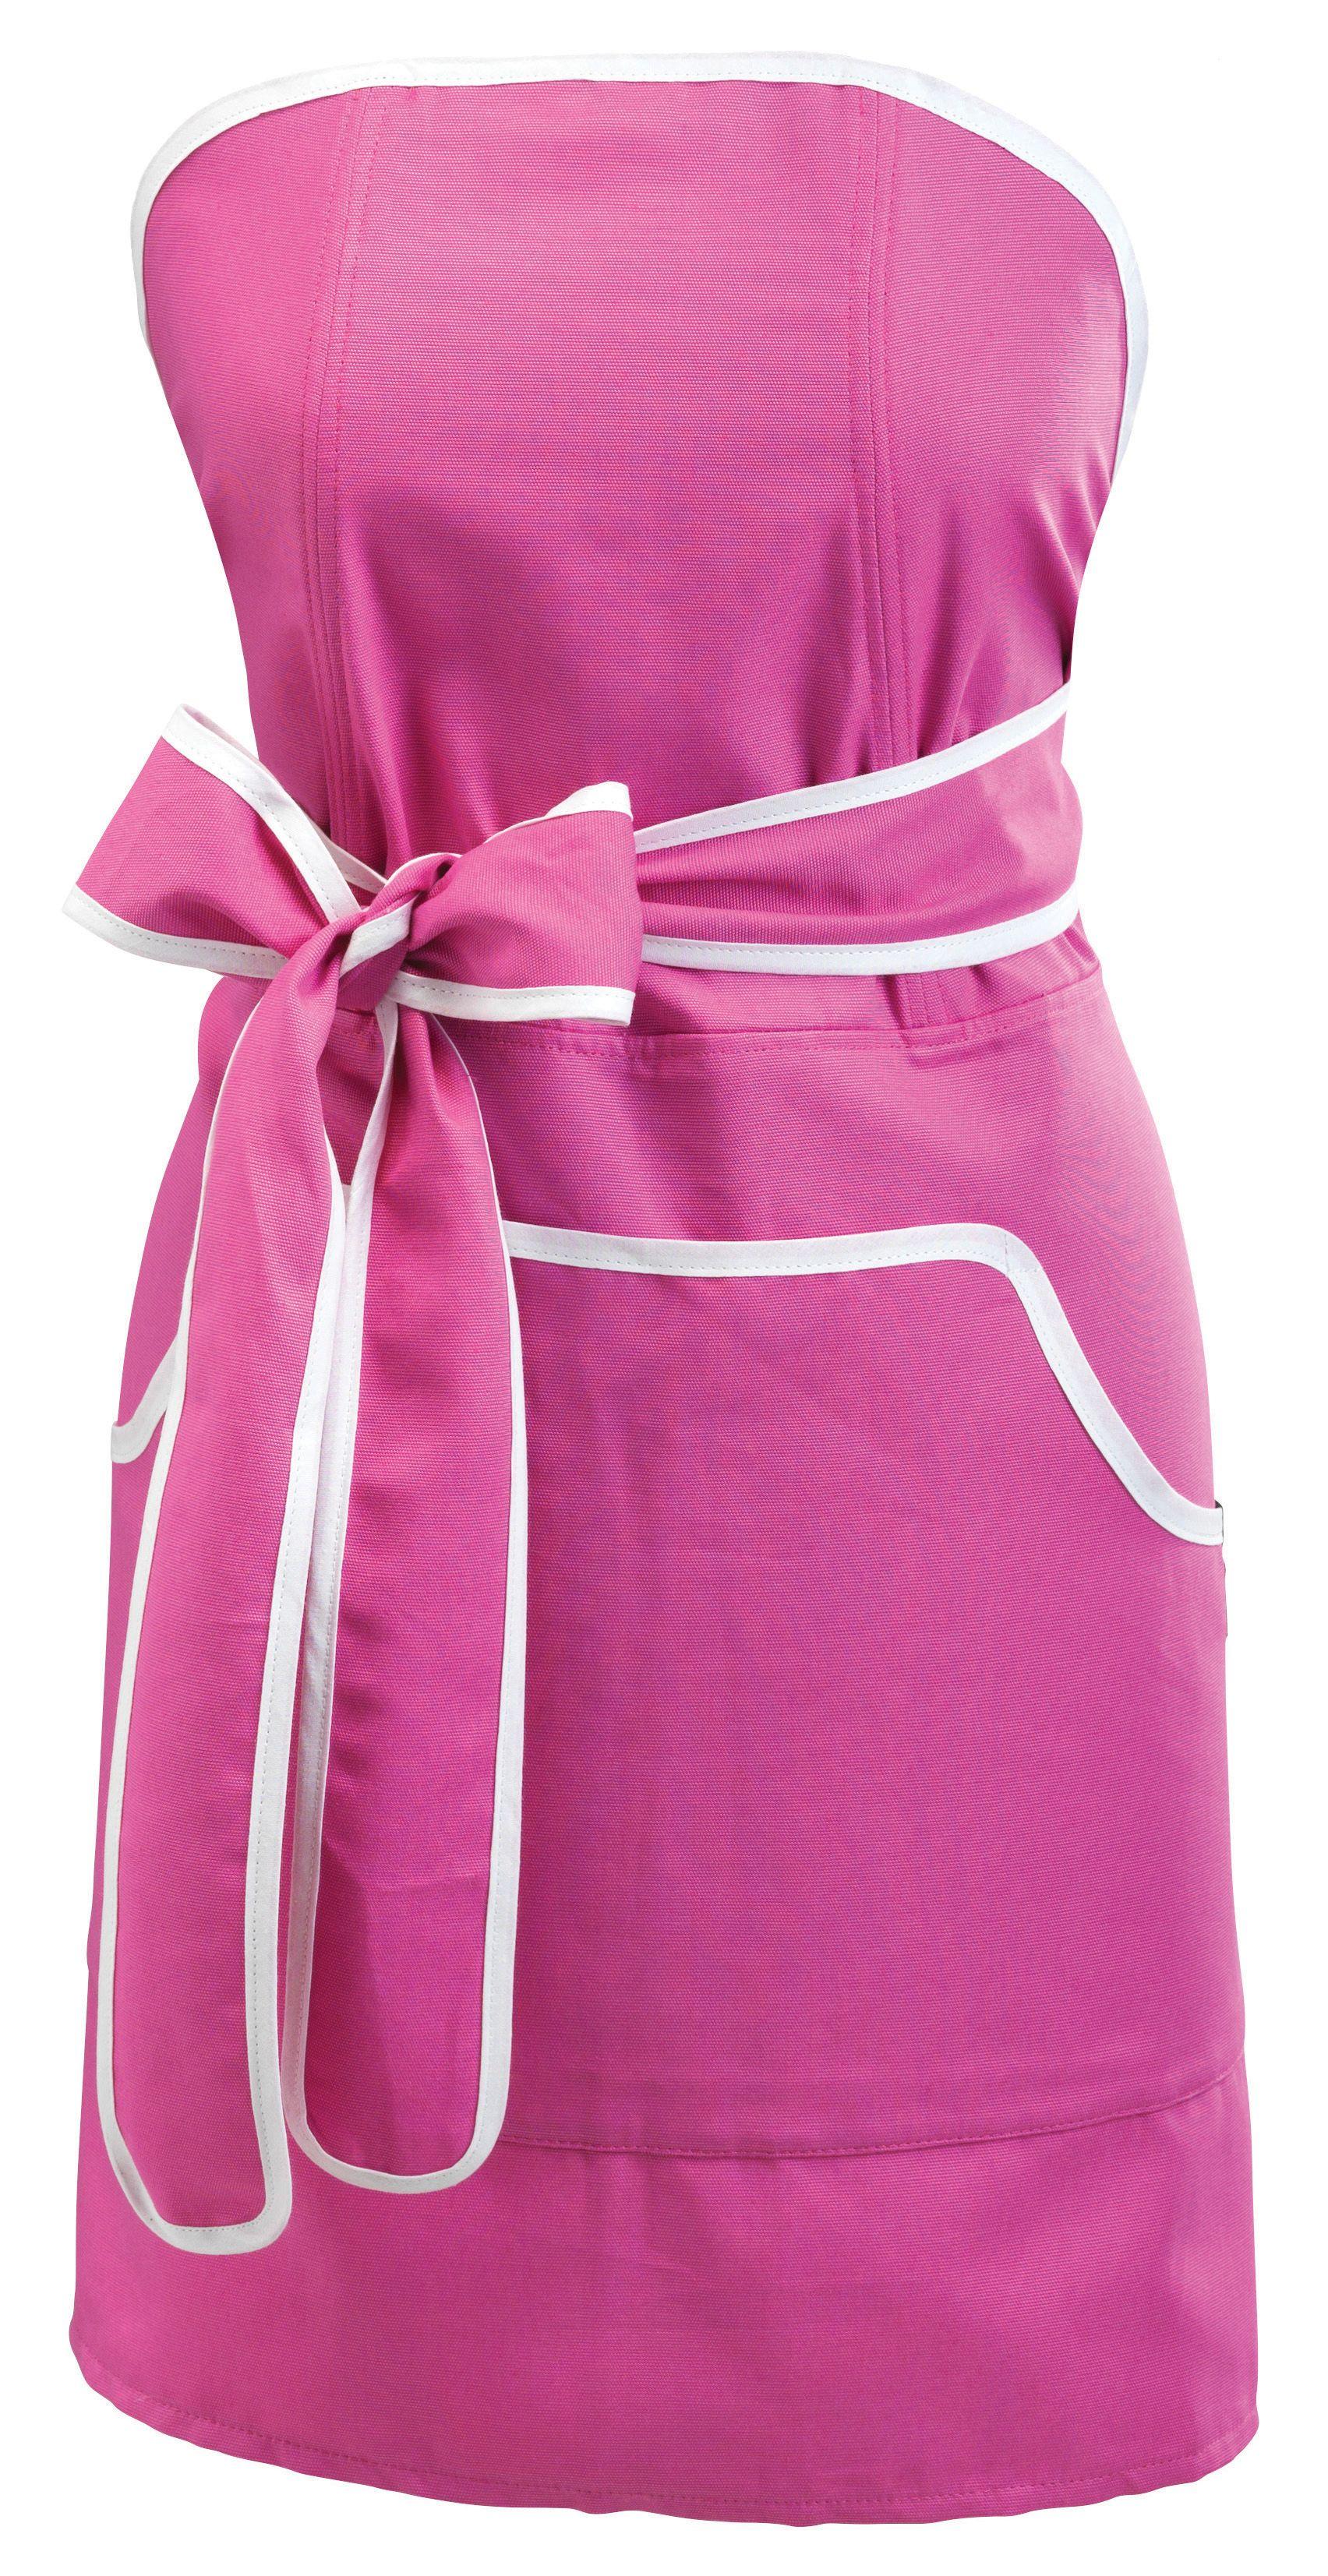 Cupcake apron pink with white banding